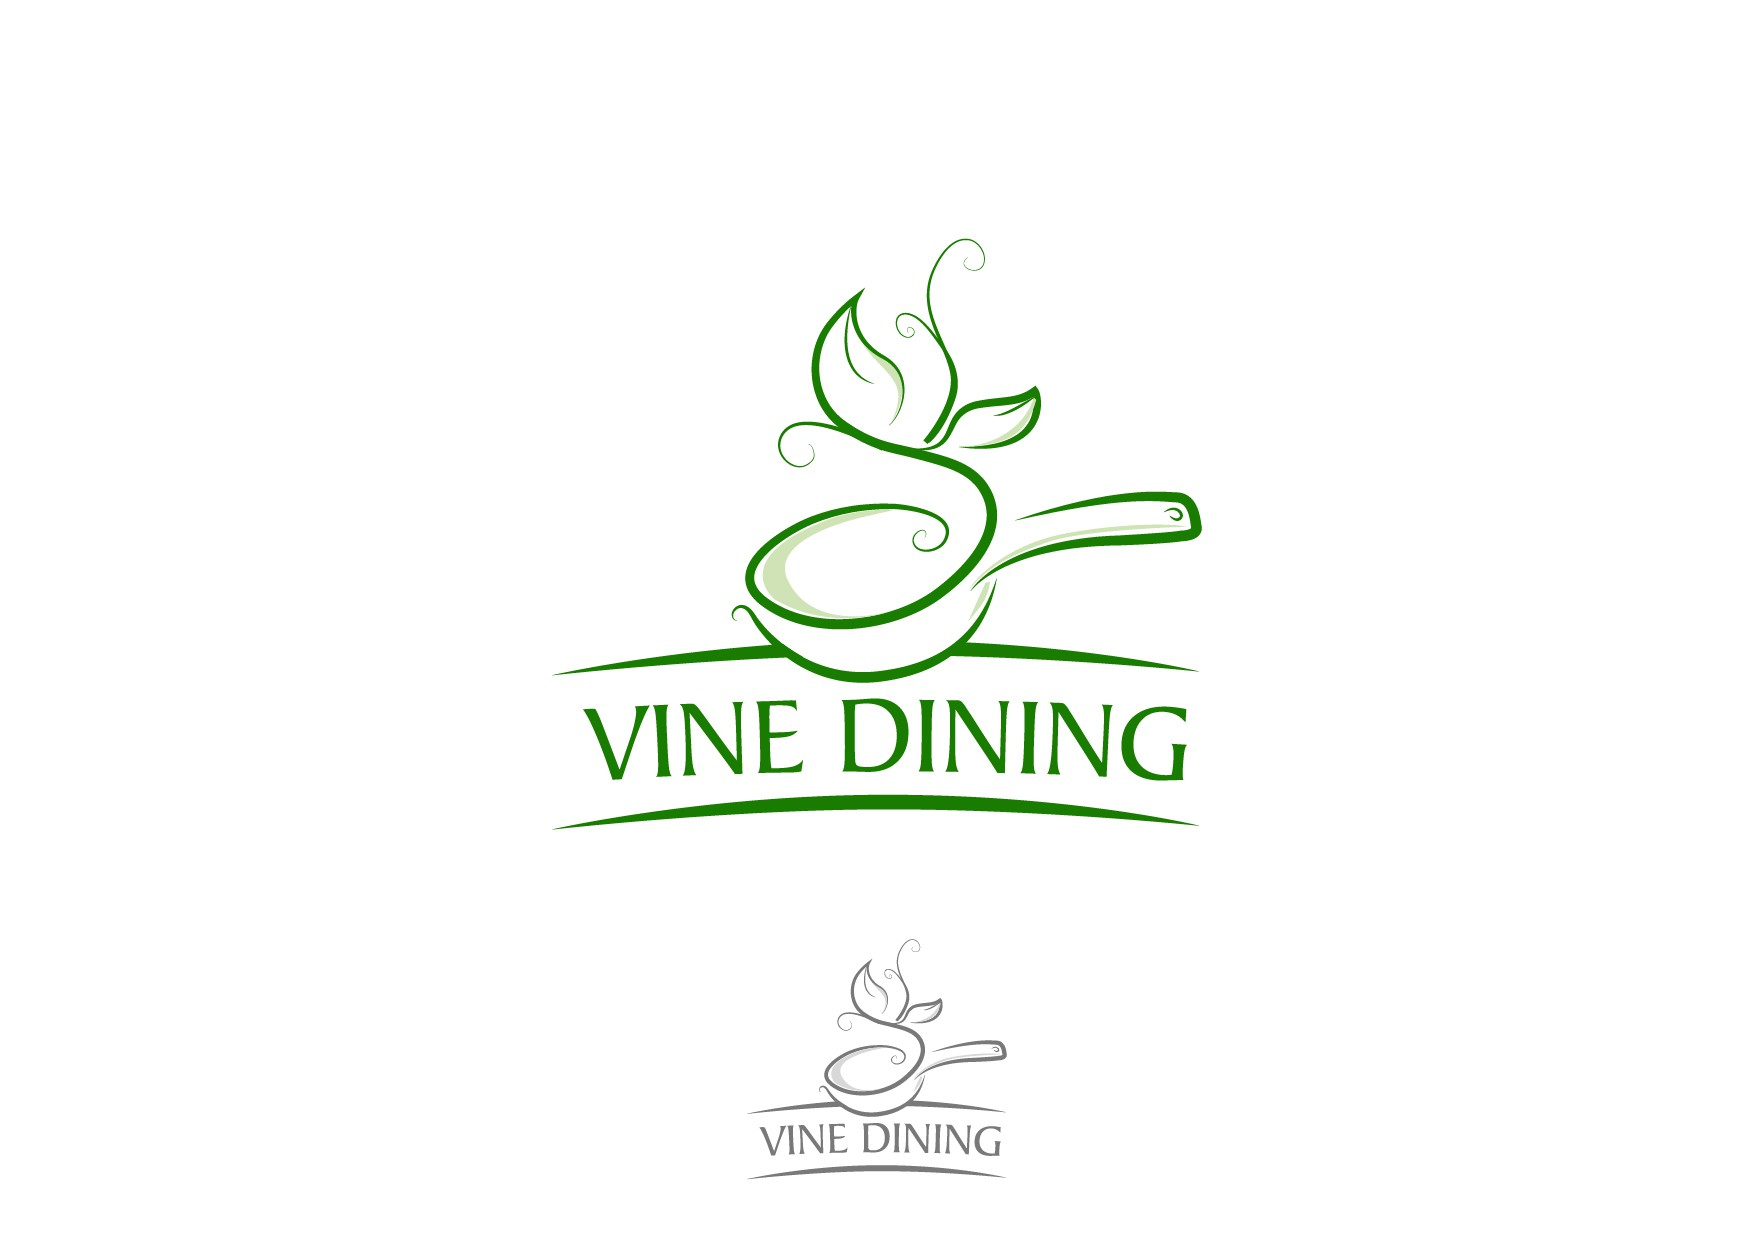 Vine Dining needs a new logo